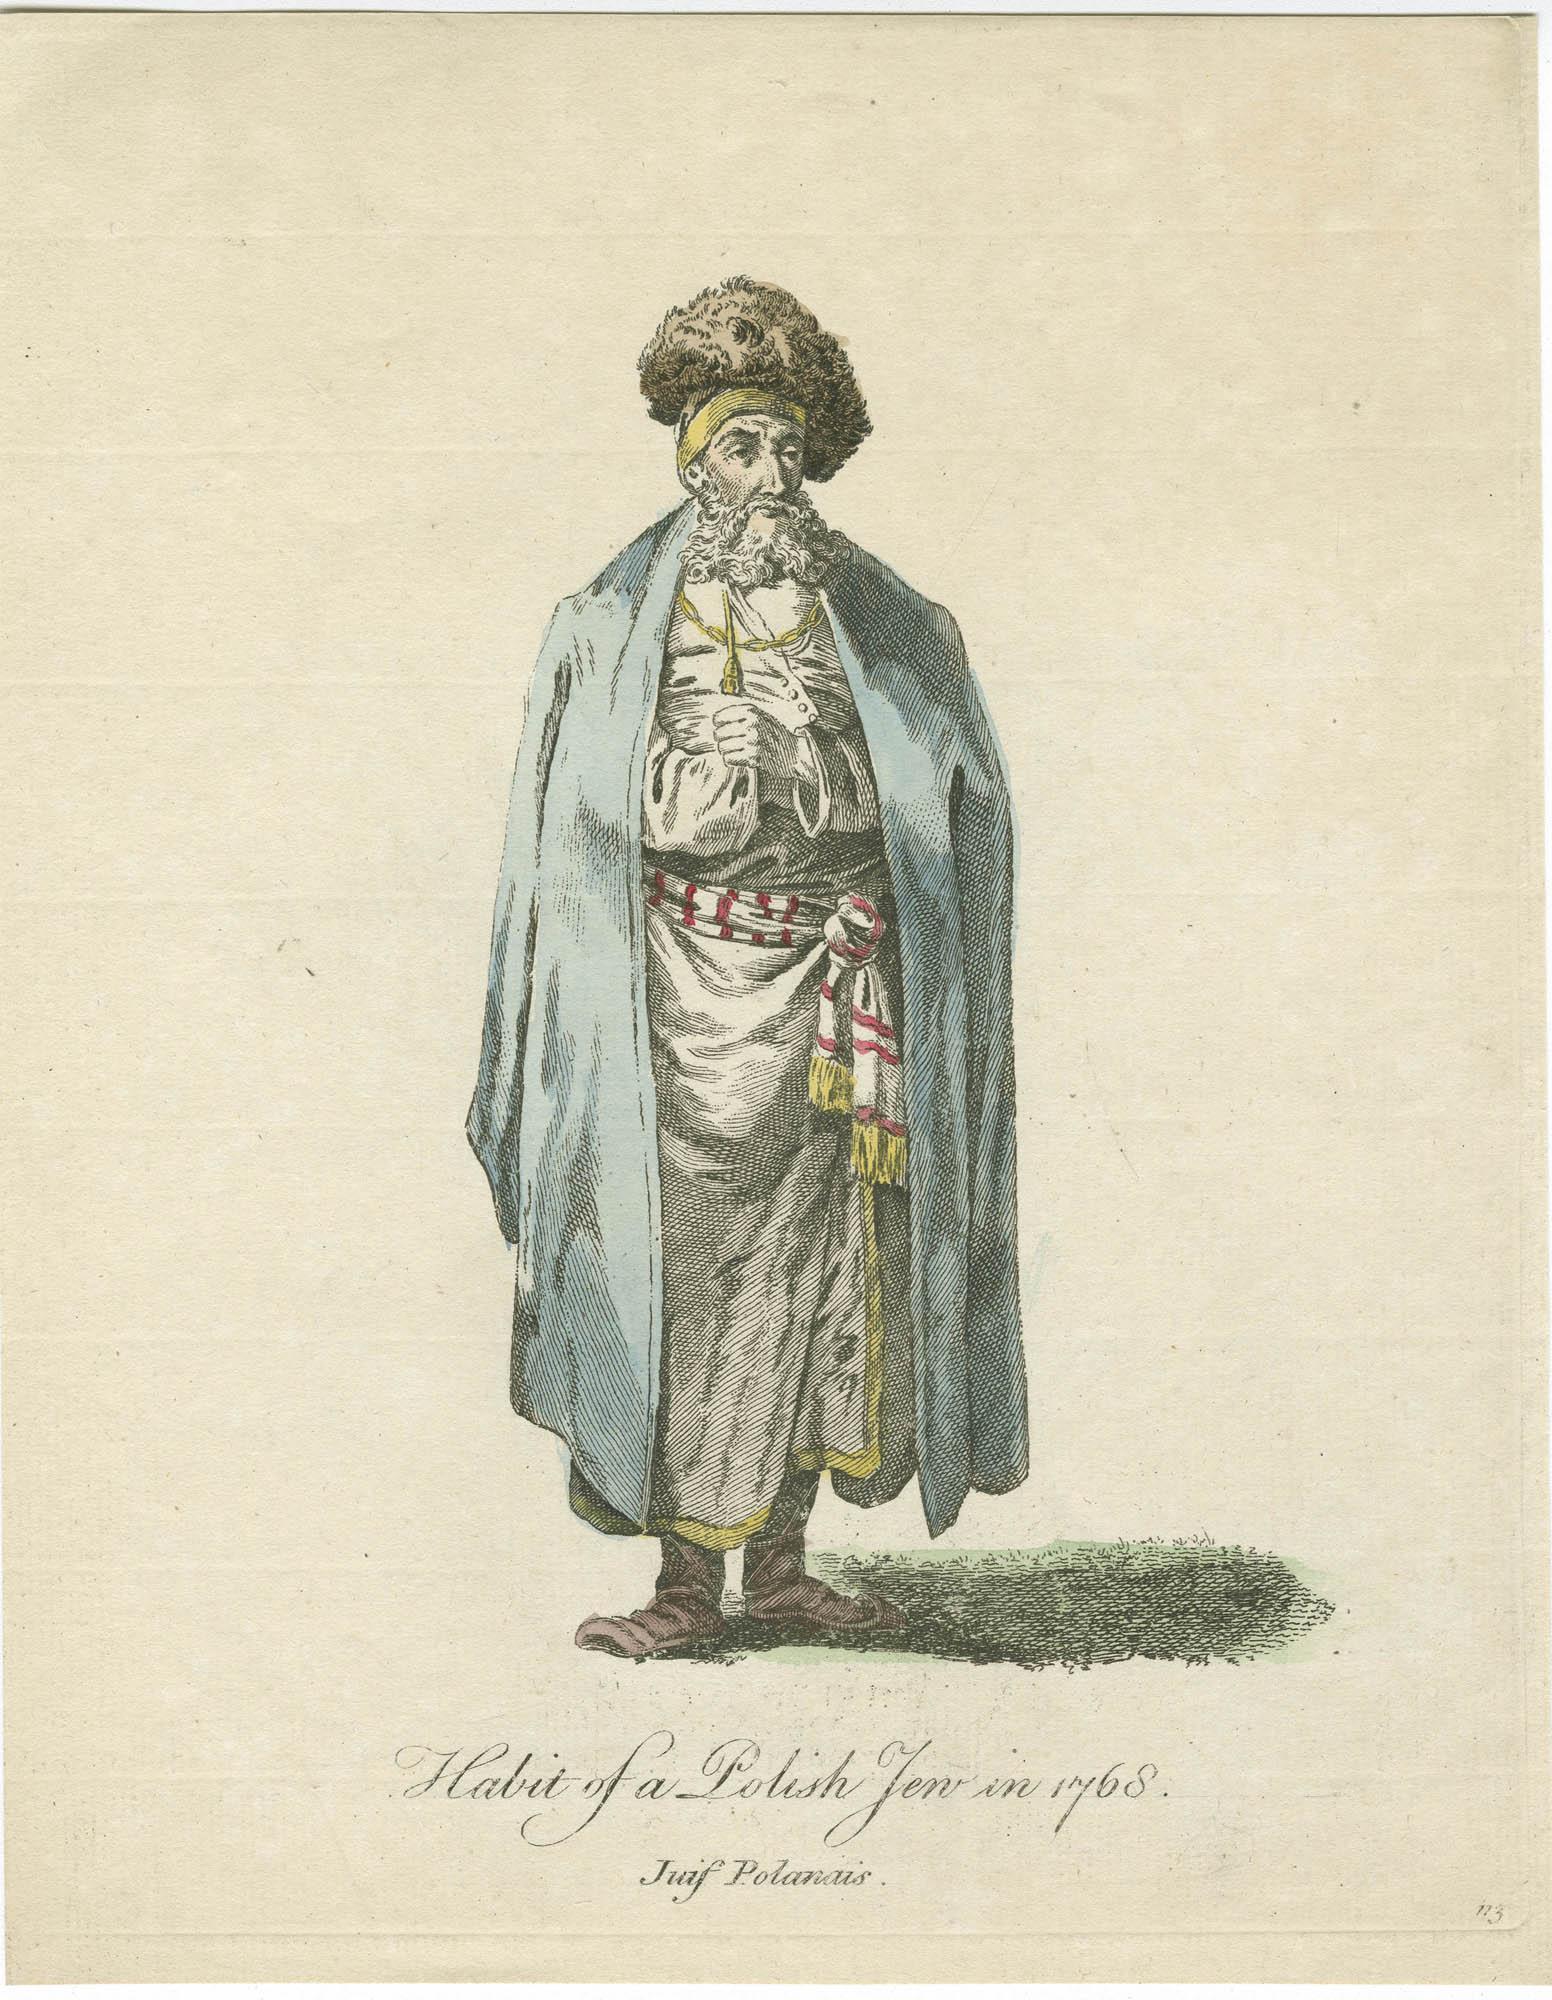 Habit of a Polish Jew in 1768 / Juif Polanais